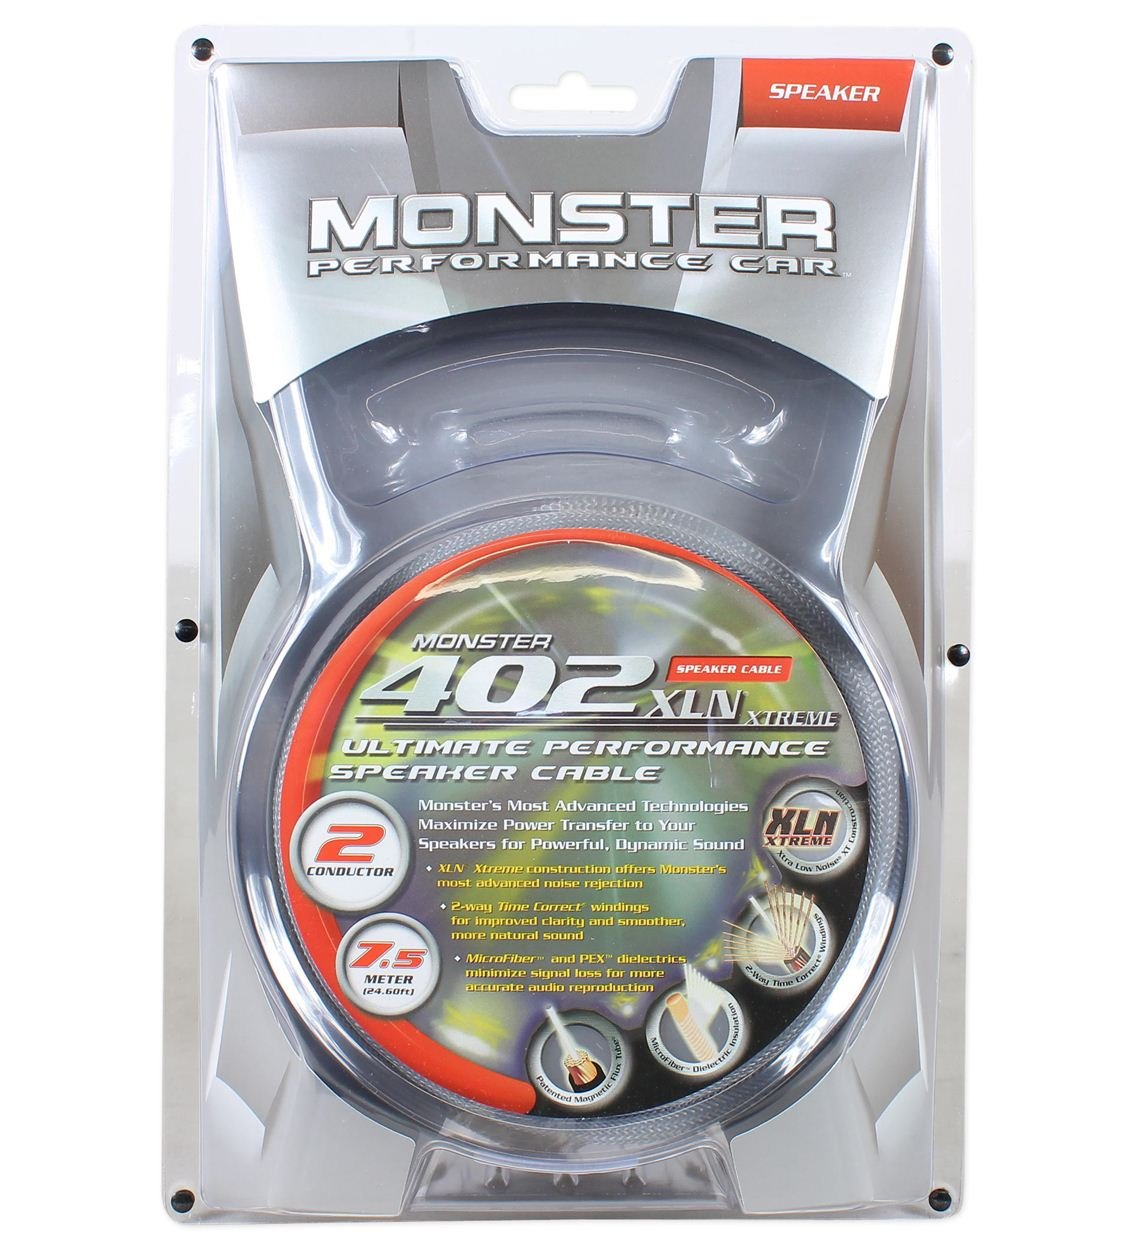 Amazon.com: Monster Cable MPC S402 2C-7.5M 7.5M 25\' Feet Audiophile ...